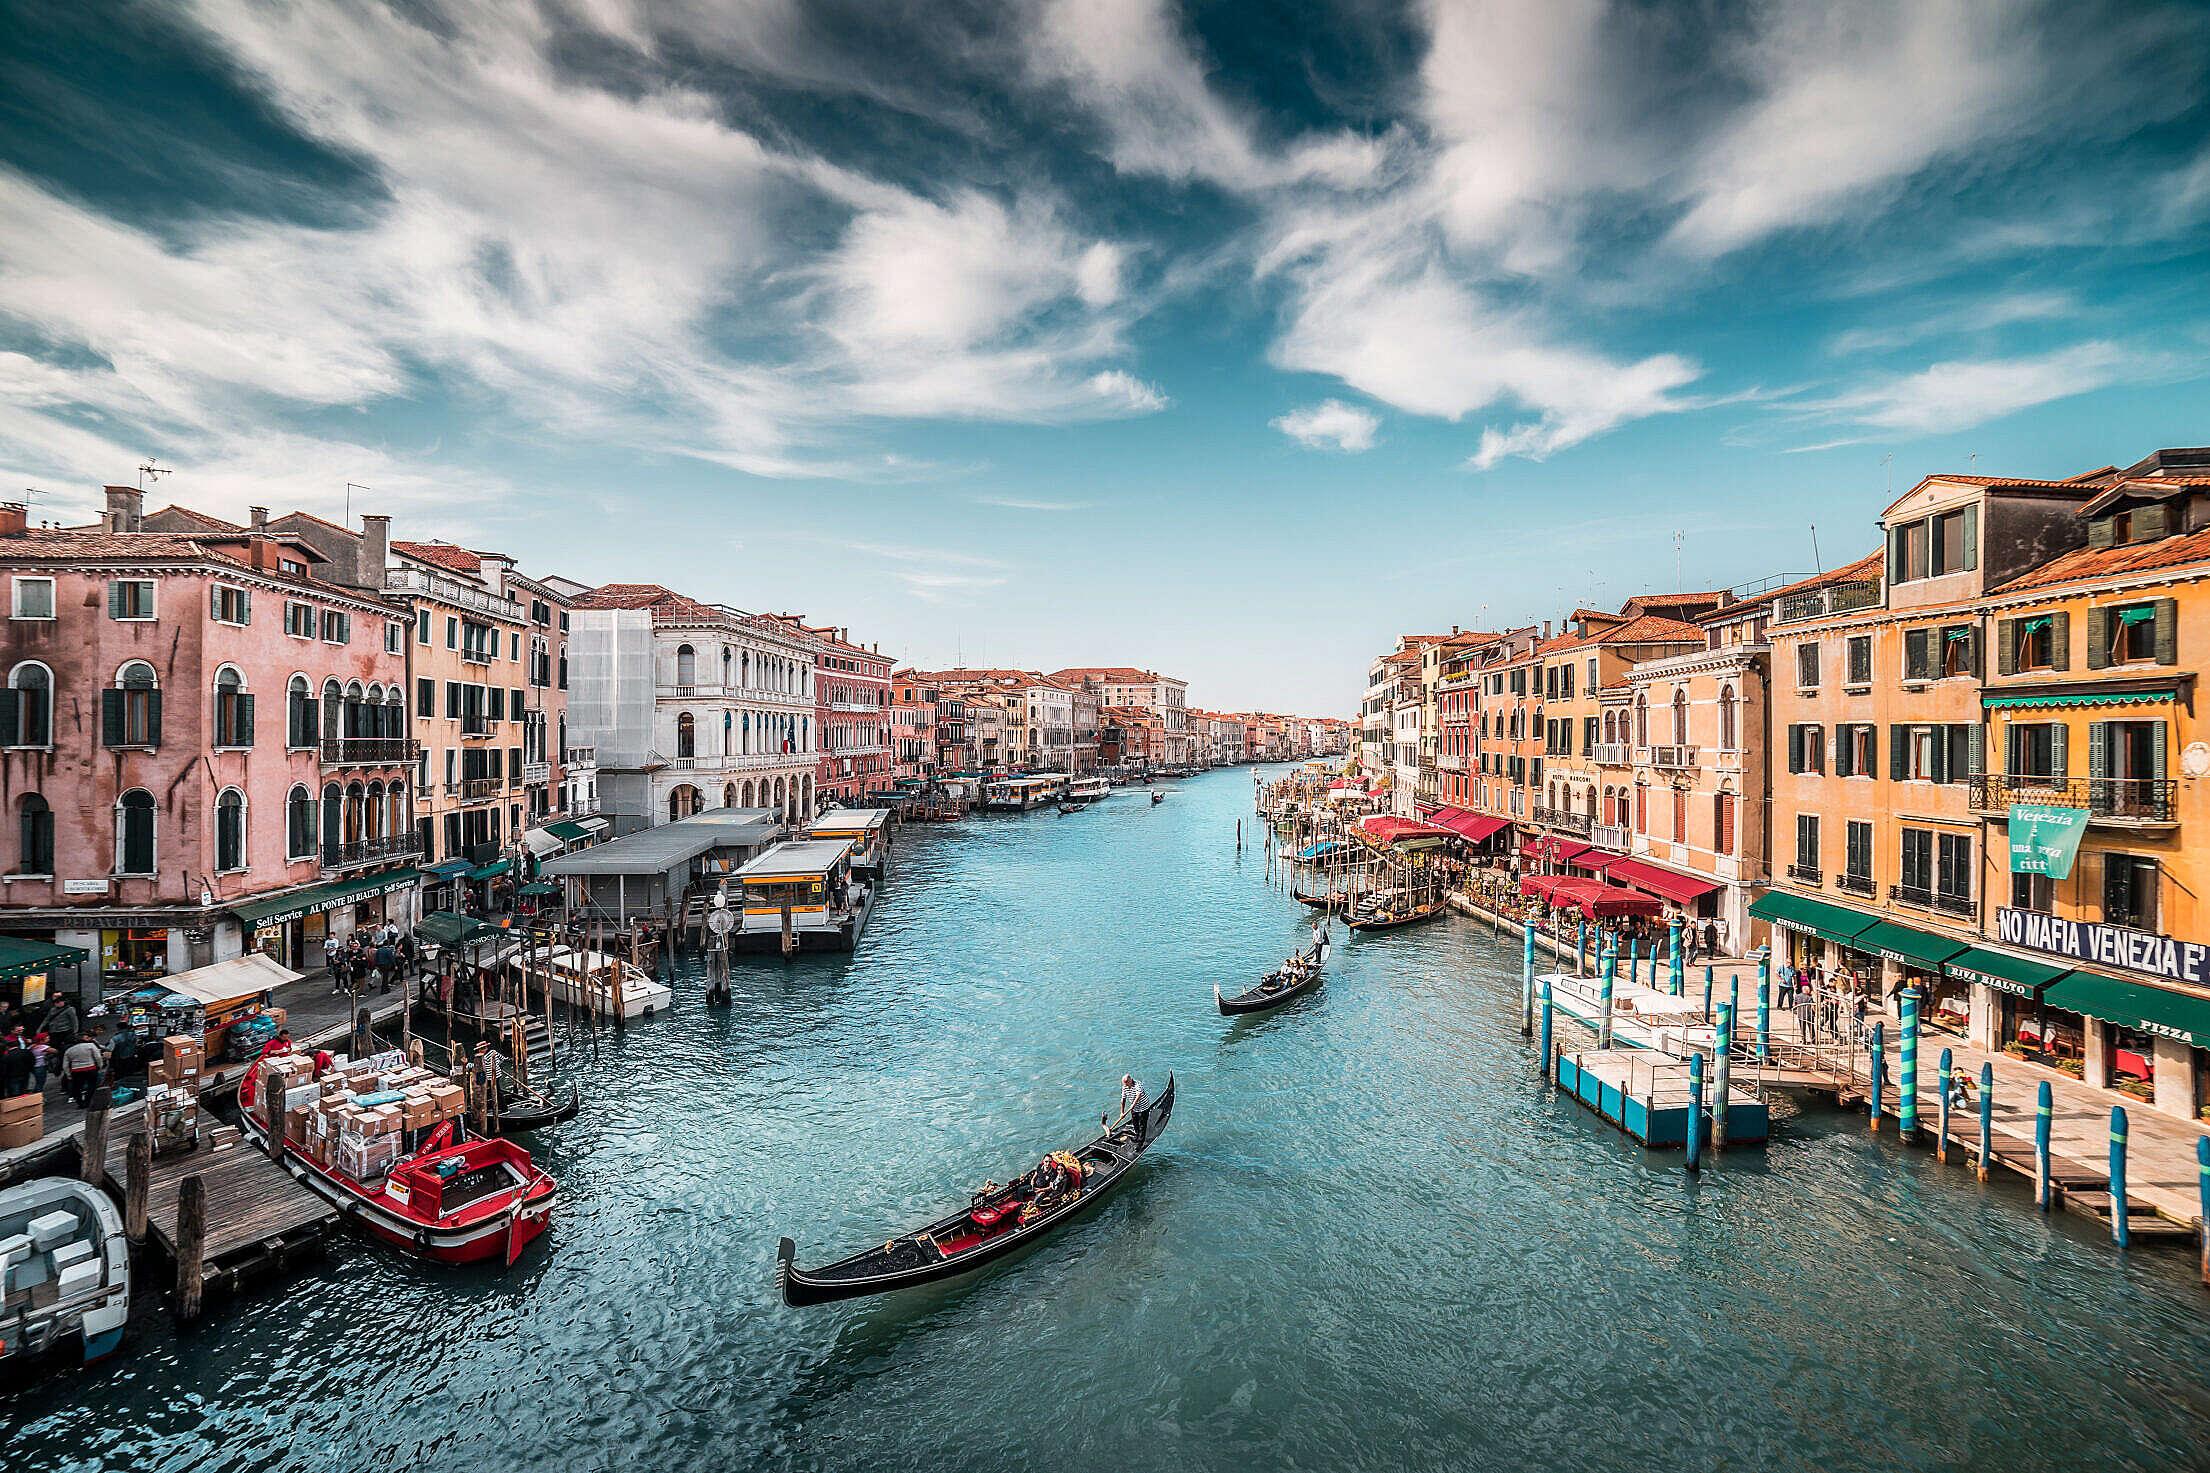 Canal Grande with Gondolas in Venice Free Stock Photo